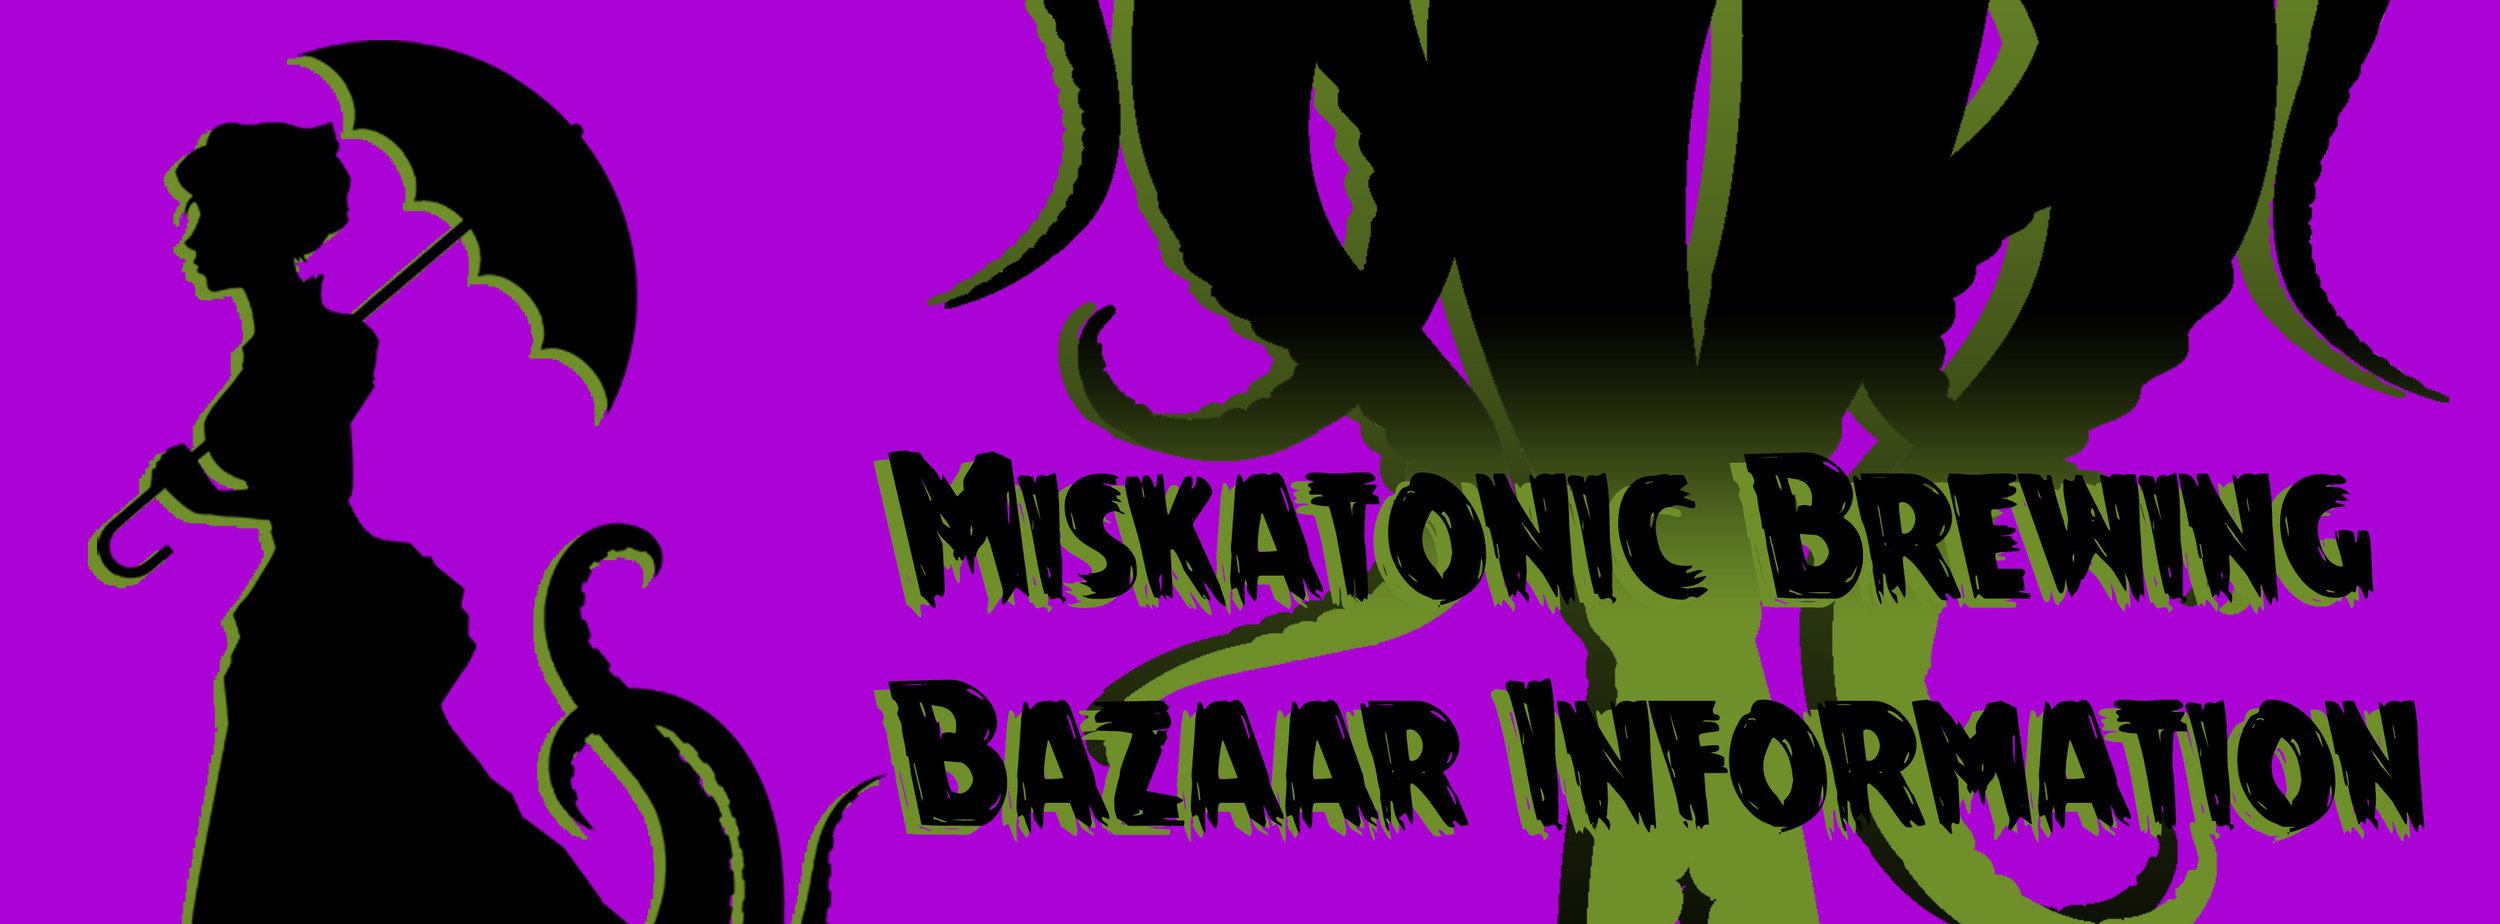 Bazaar Information.jpg